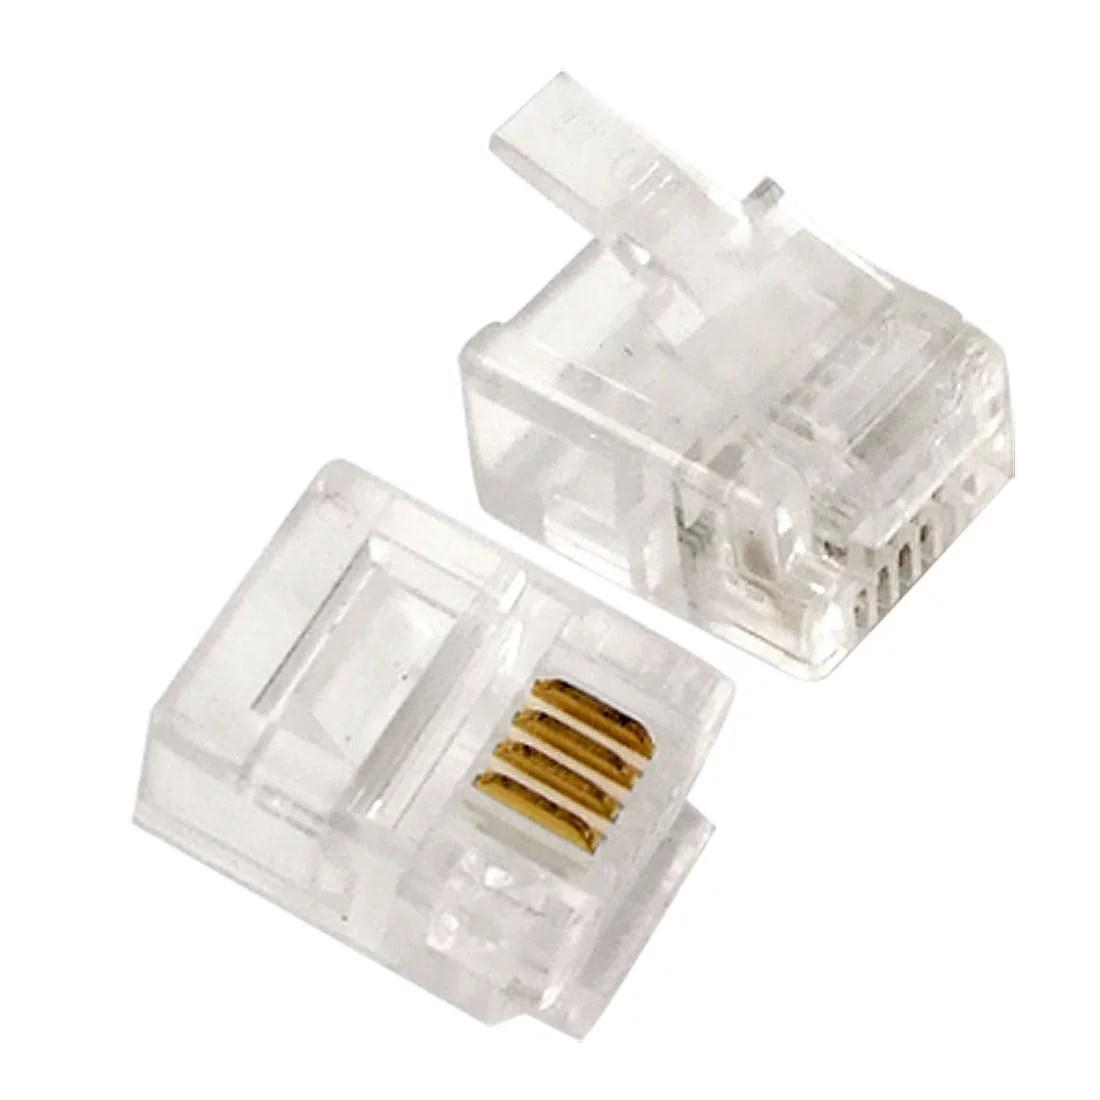 rj11 socket wiring diagram uk 1986 chevy c10 radio unique bargains 4 pcs pin 6p4c modular plug